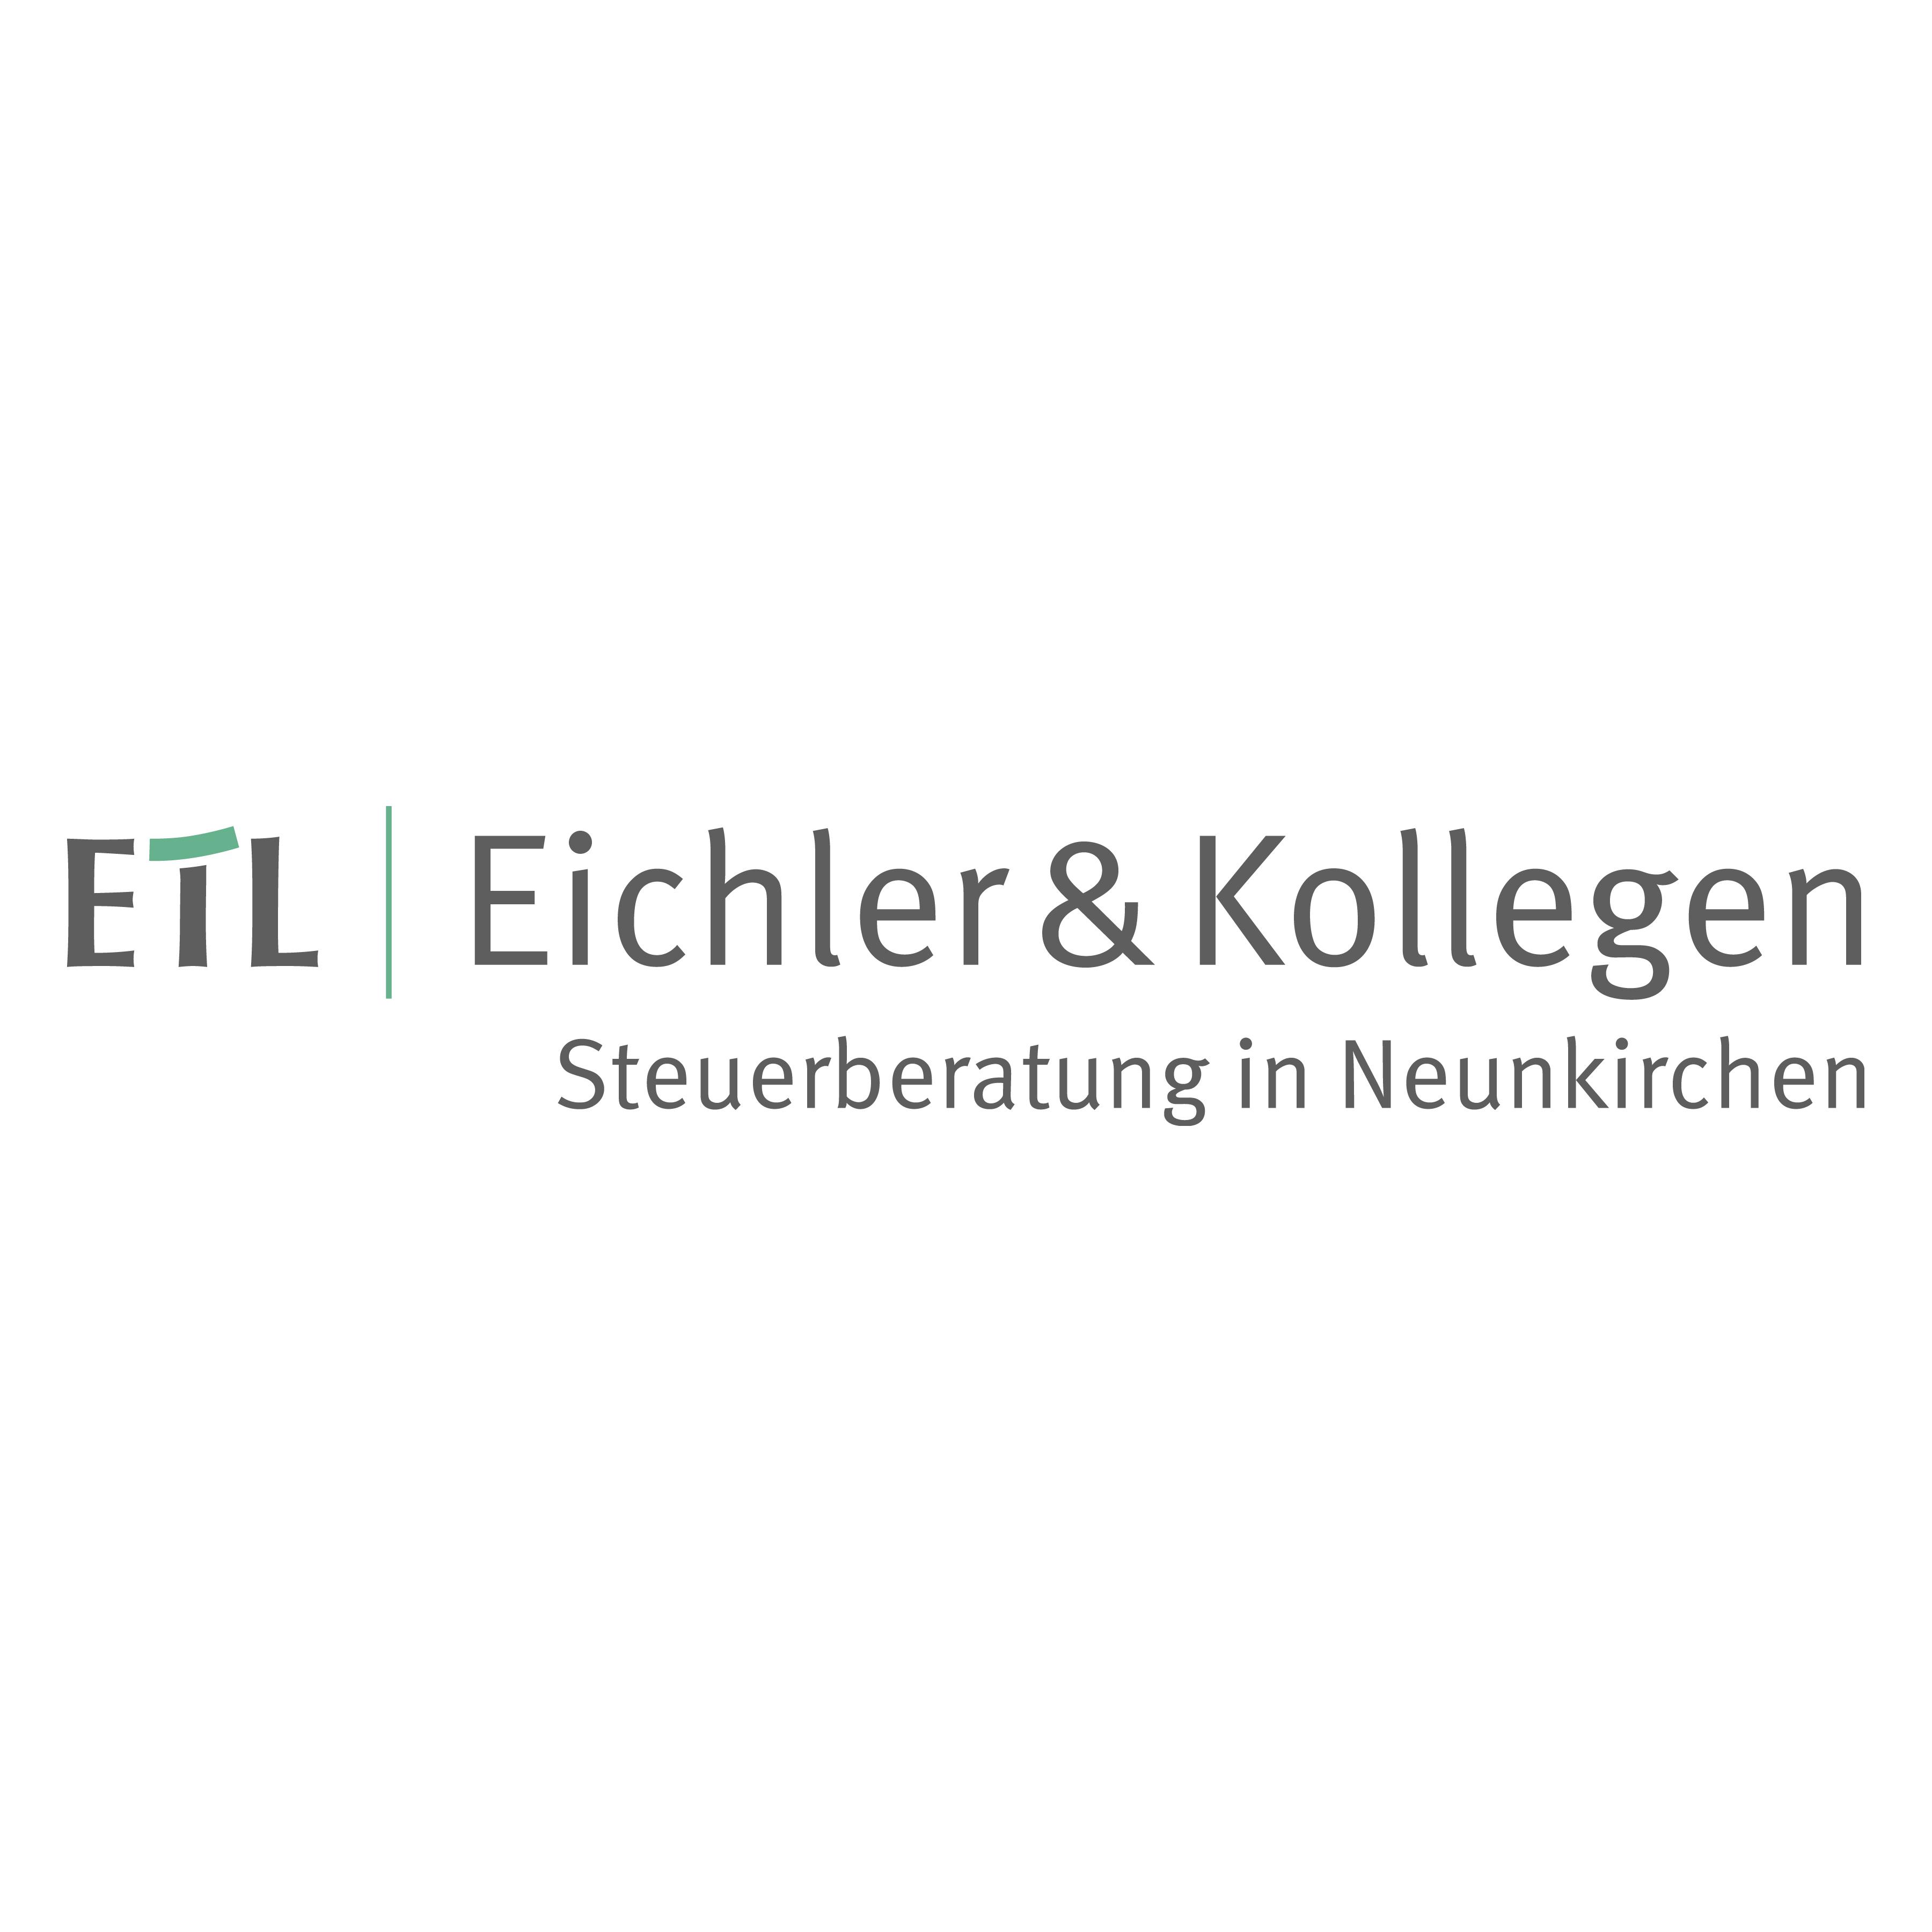 Bild zu ETL Eichler & Kollegen GmbH Steuerberatungsgesellschaft in Neunkirchen am Brand